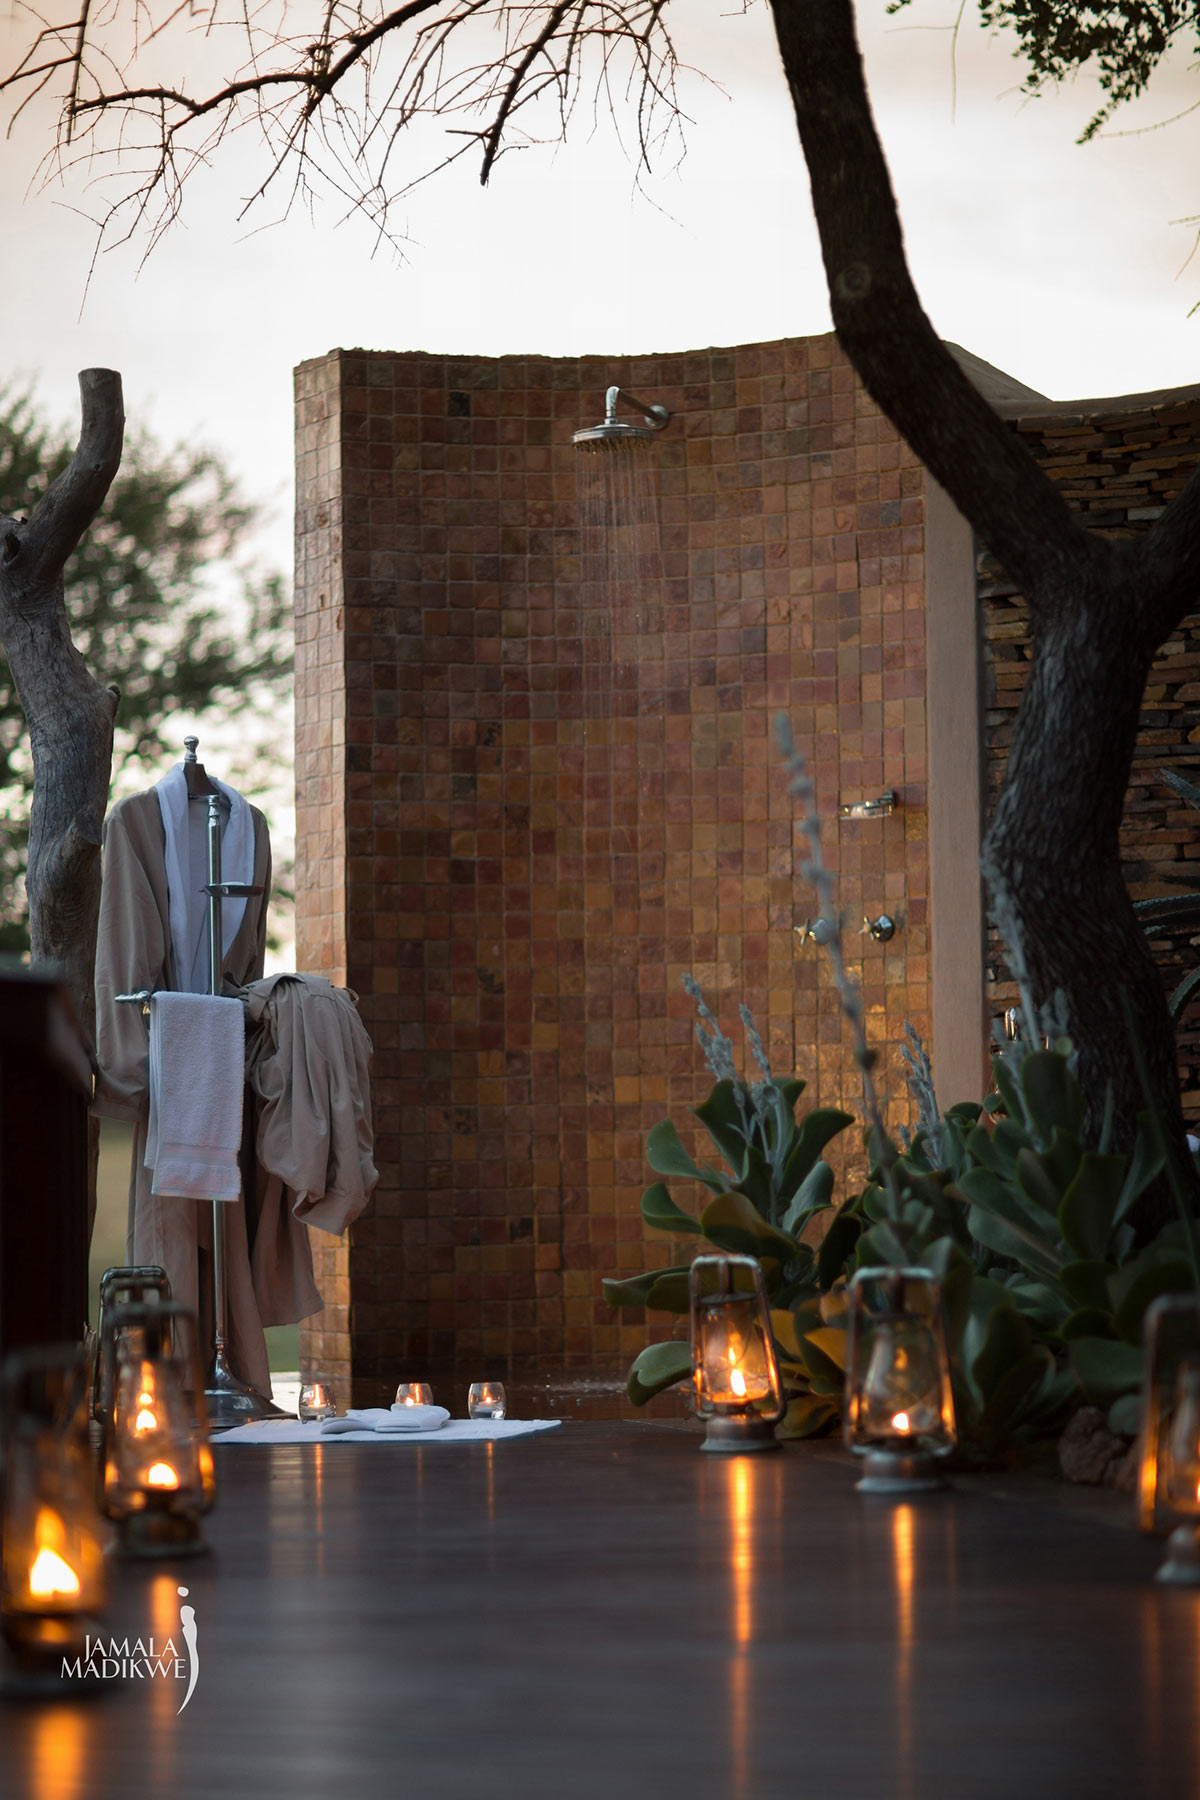 Jamala-Madikwe-Royal-Safari-Lodge_Villa-Outdoor-Shower.jpg